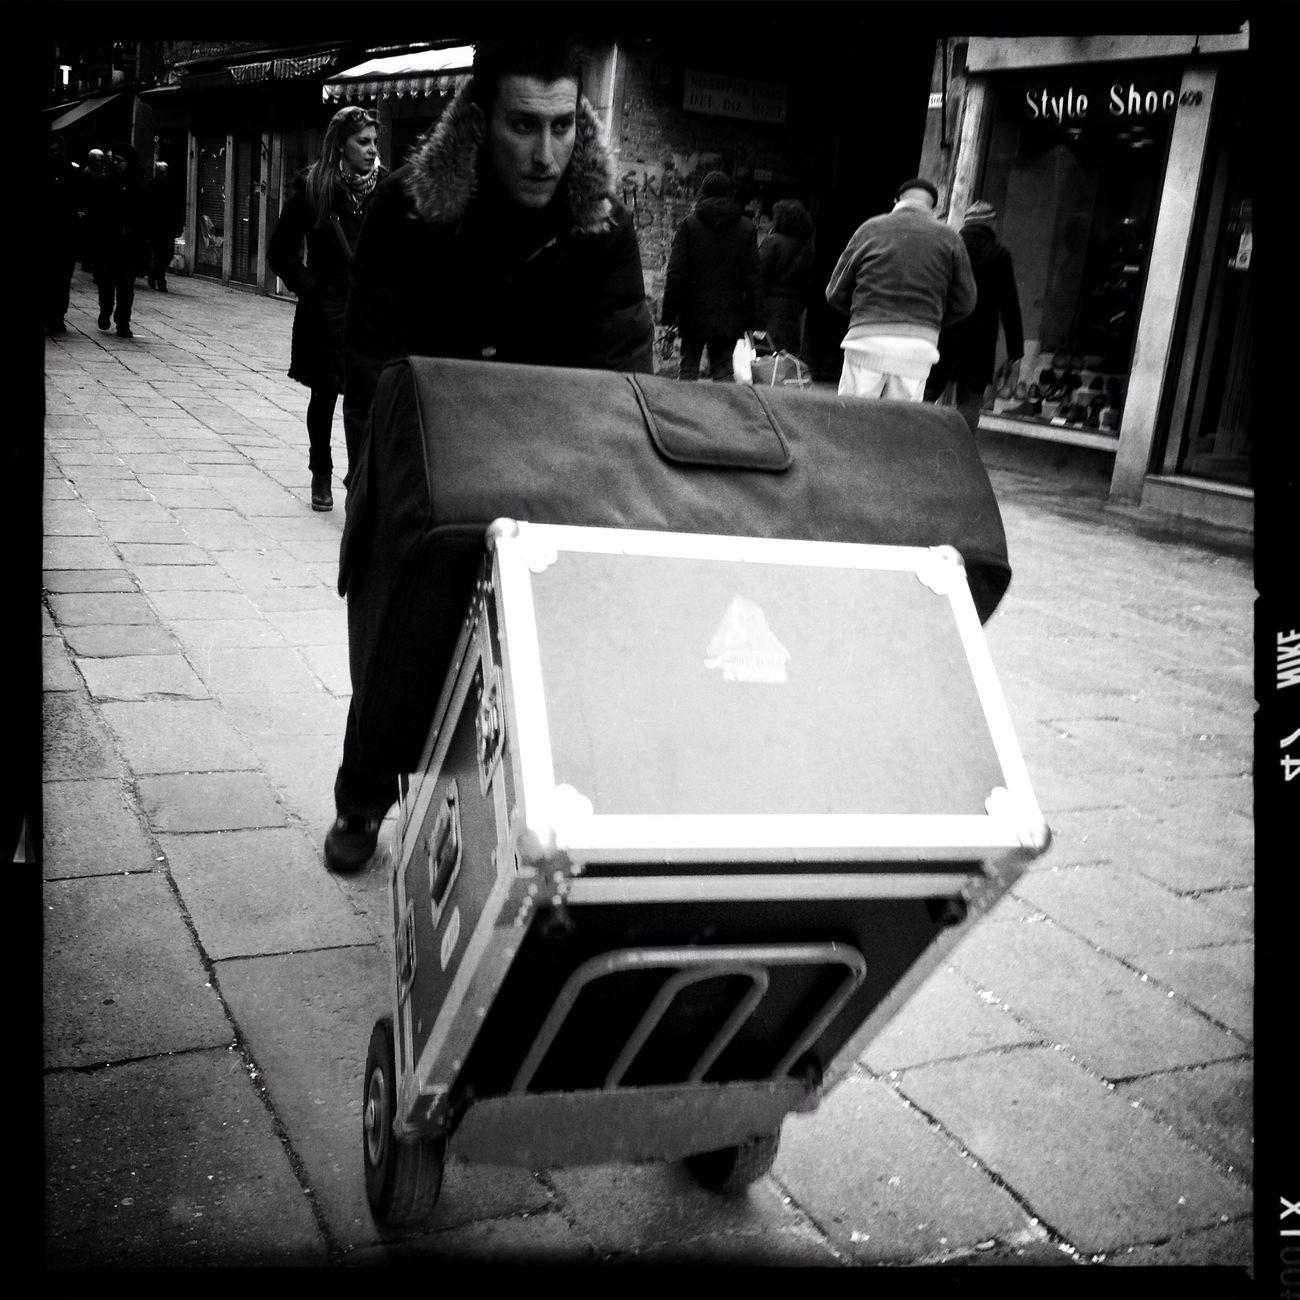 streetphotography at Venezia AO DLX Film No Flash Streetphotography